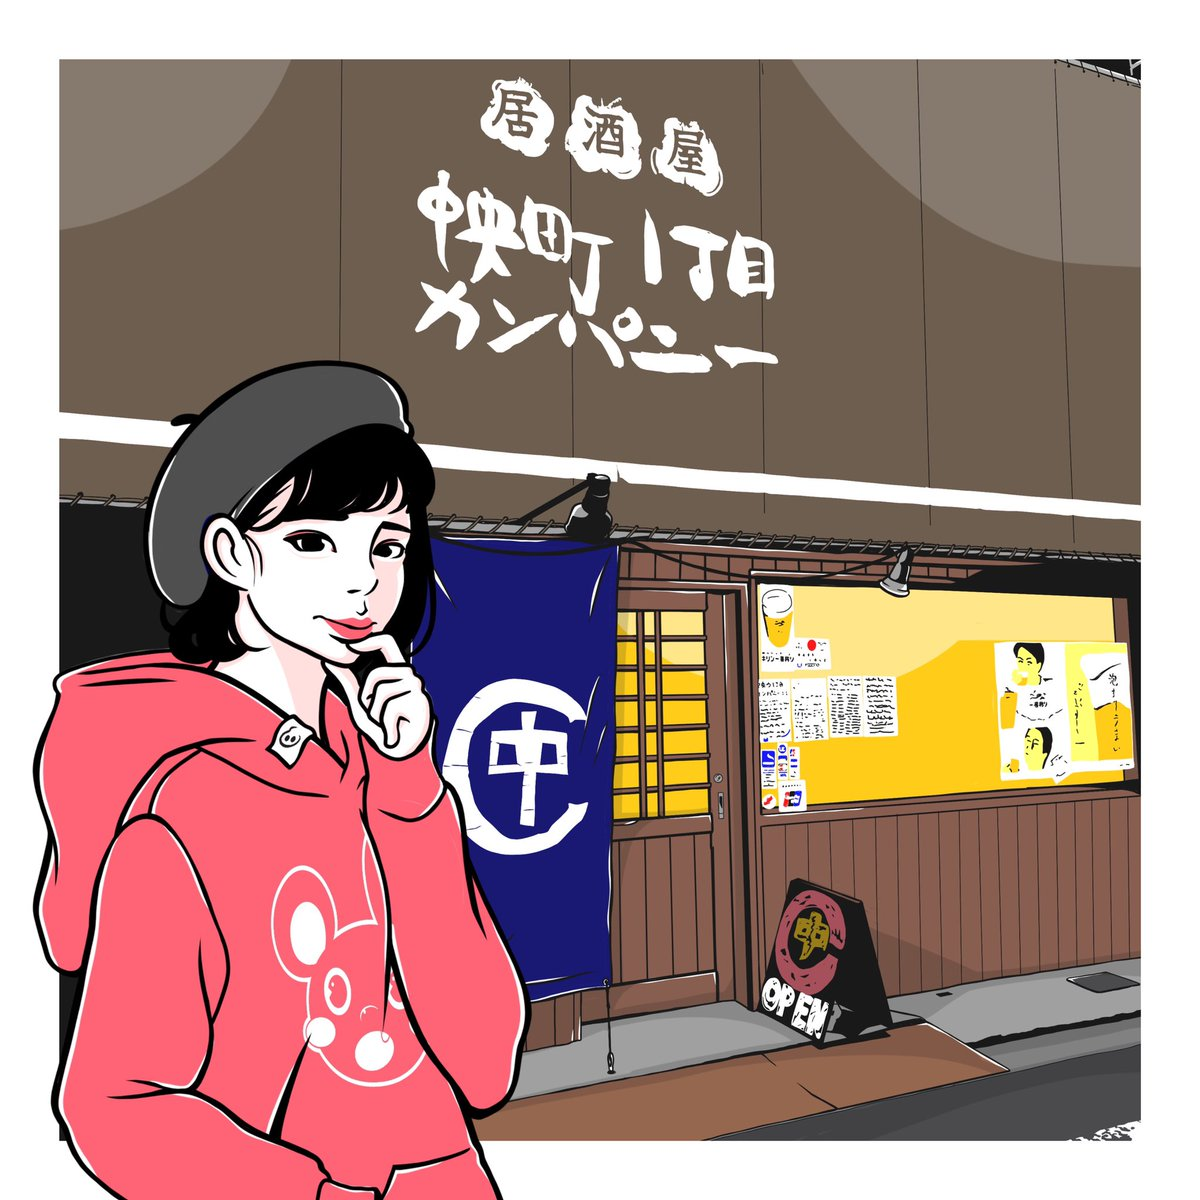 Kozi69コヲジロック On Twitter 固定用最近のイラストまとめ